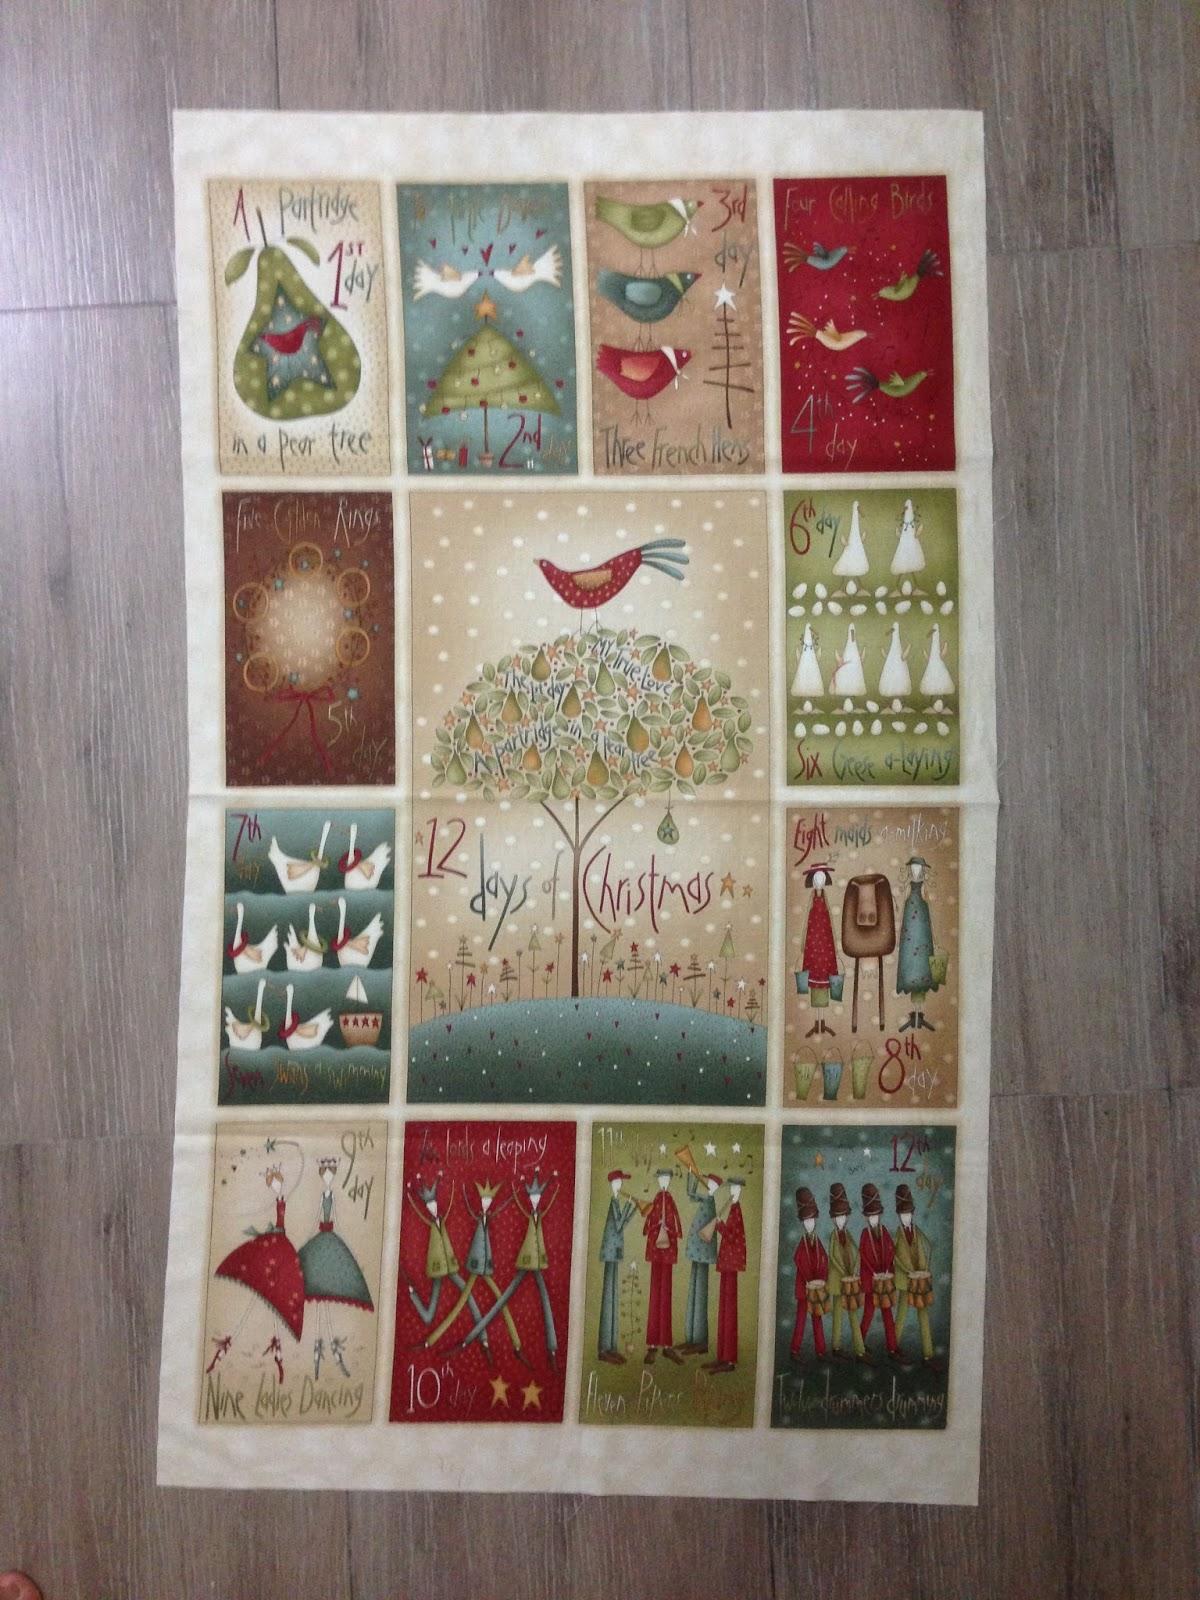 Joys of Christmas Quilt - The Cotton ShoppeThe Cotton Shoppe : christmas quilt panels - Adamdwight.com